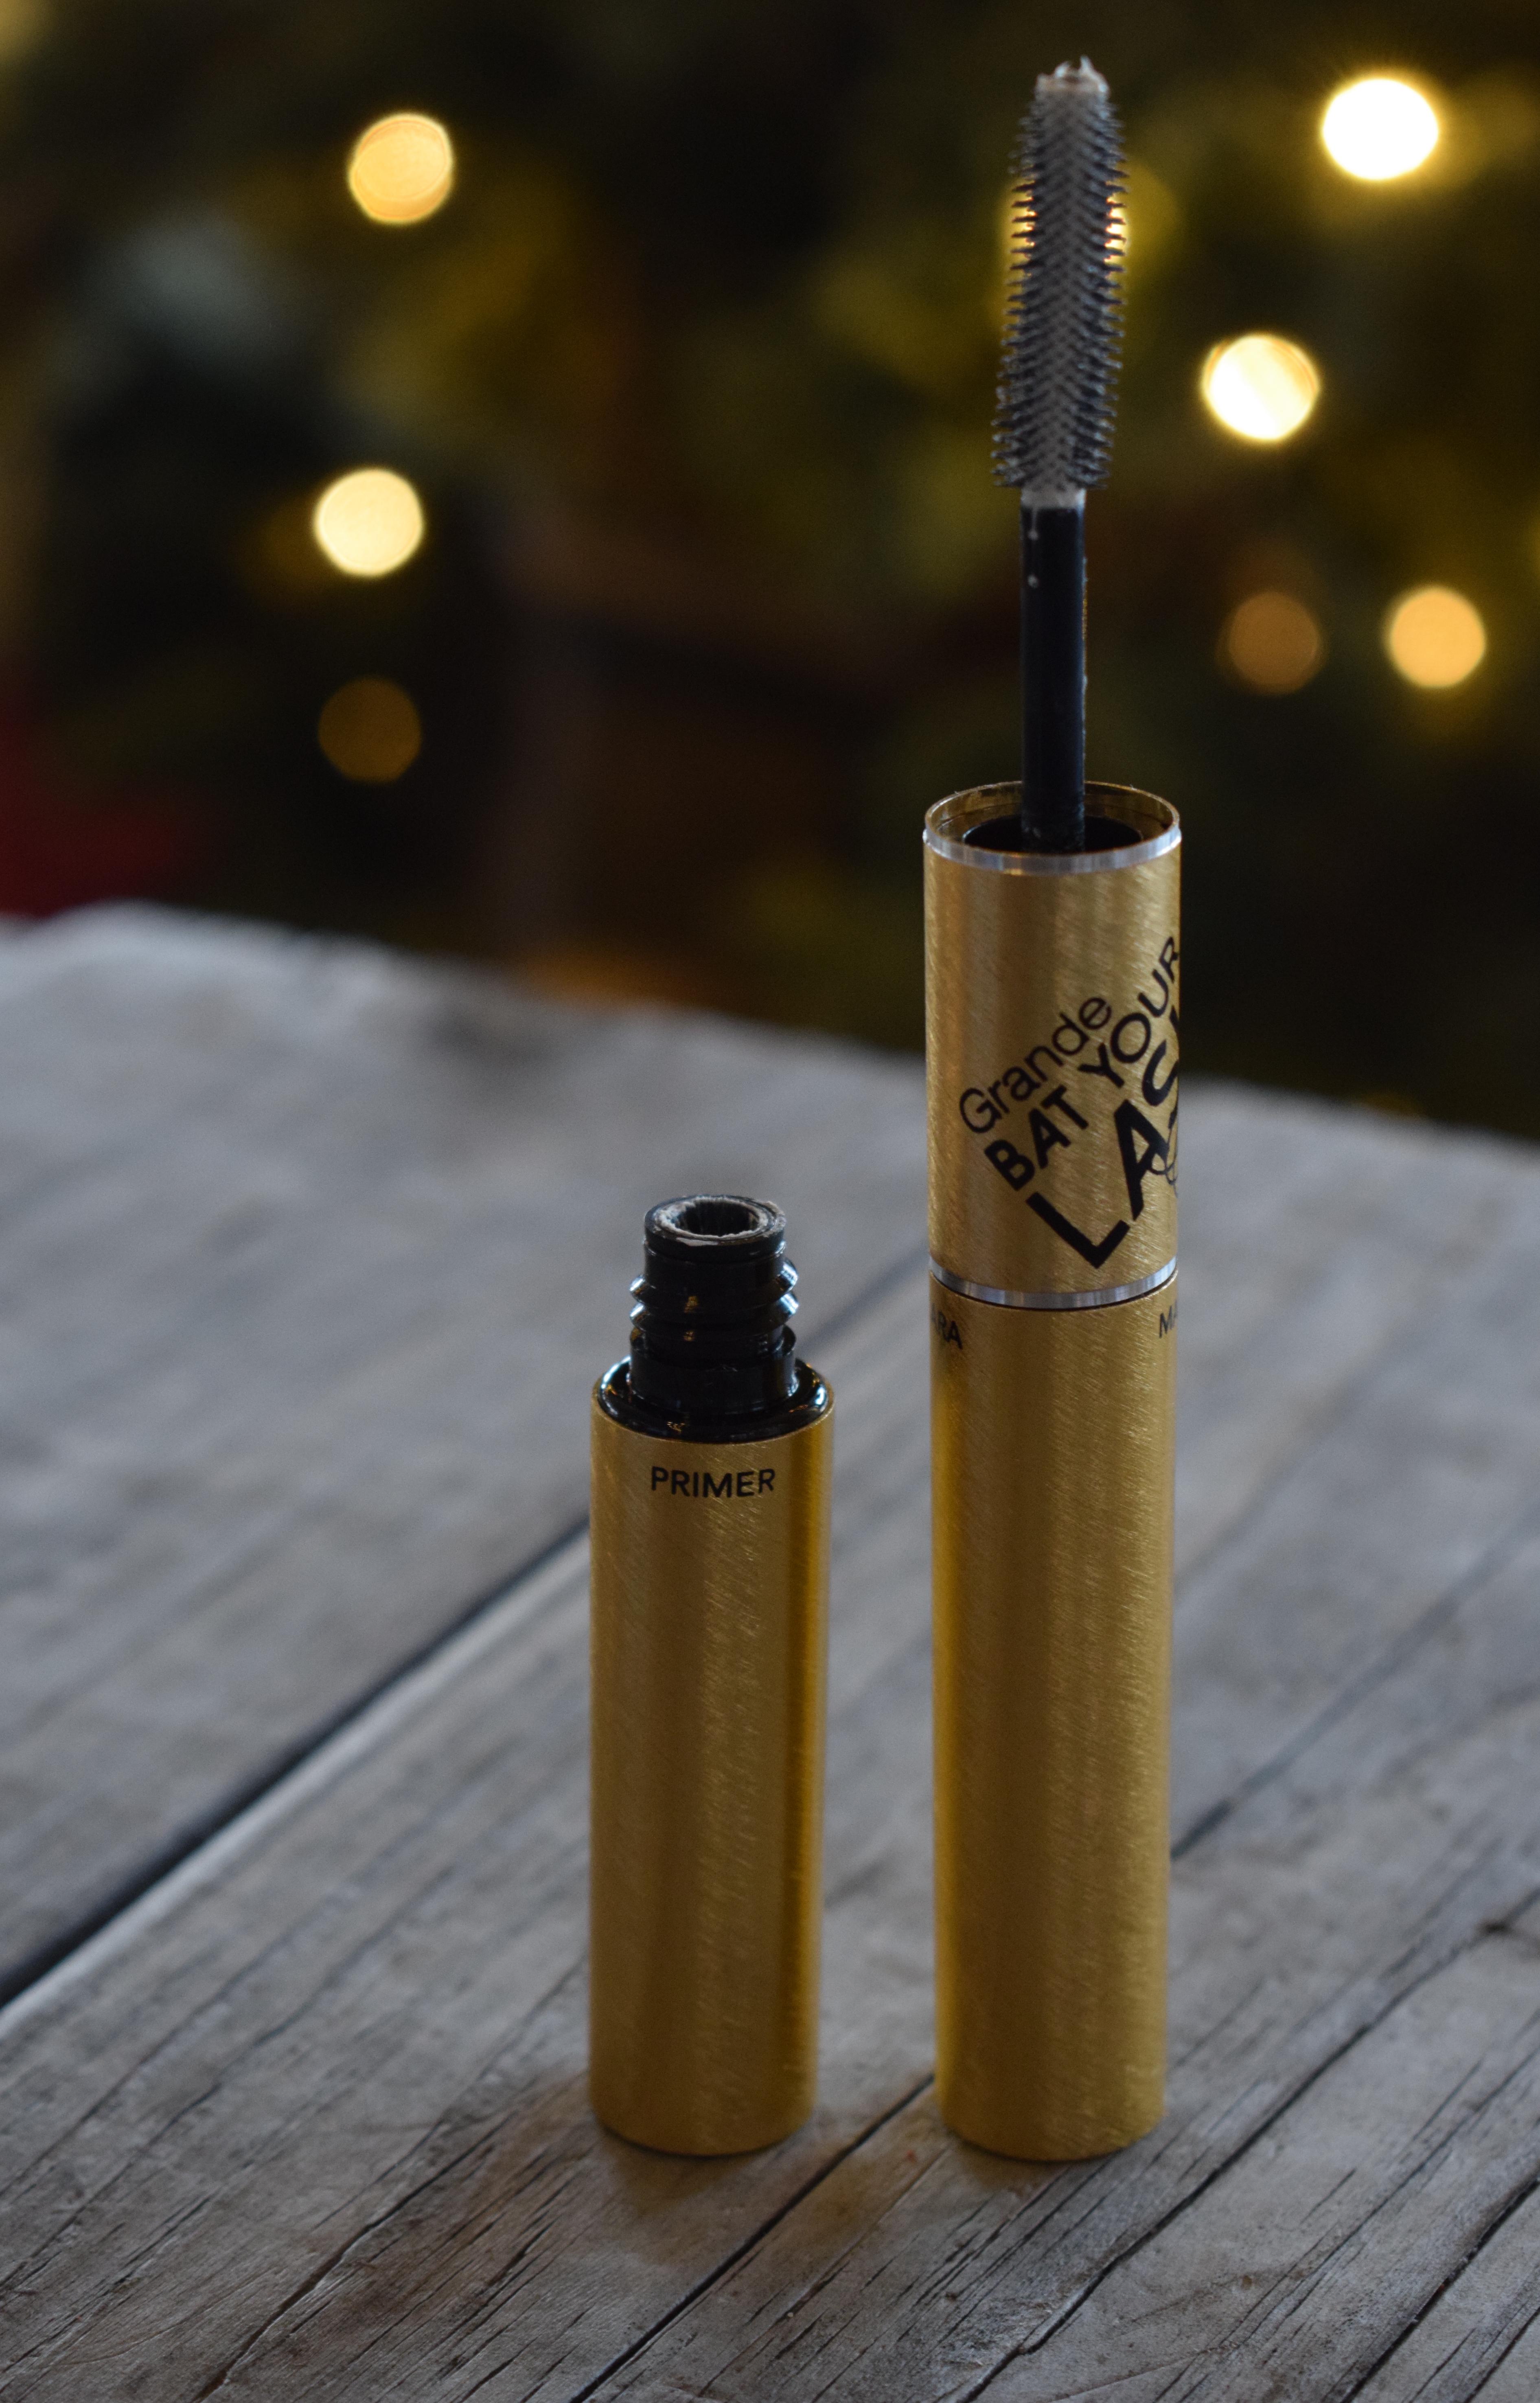 Grande Bat Your Lashes Mascara & Primer Duo Review